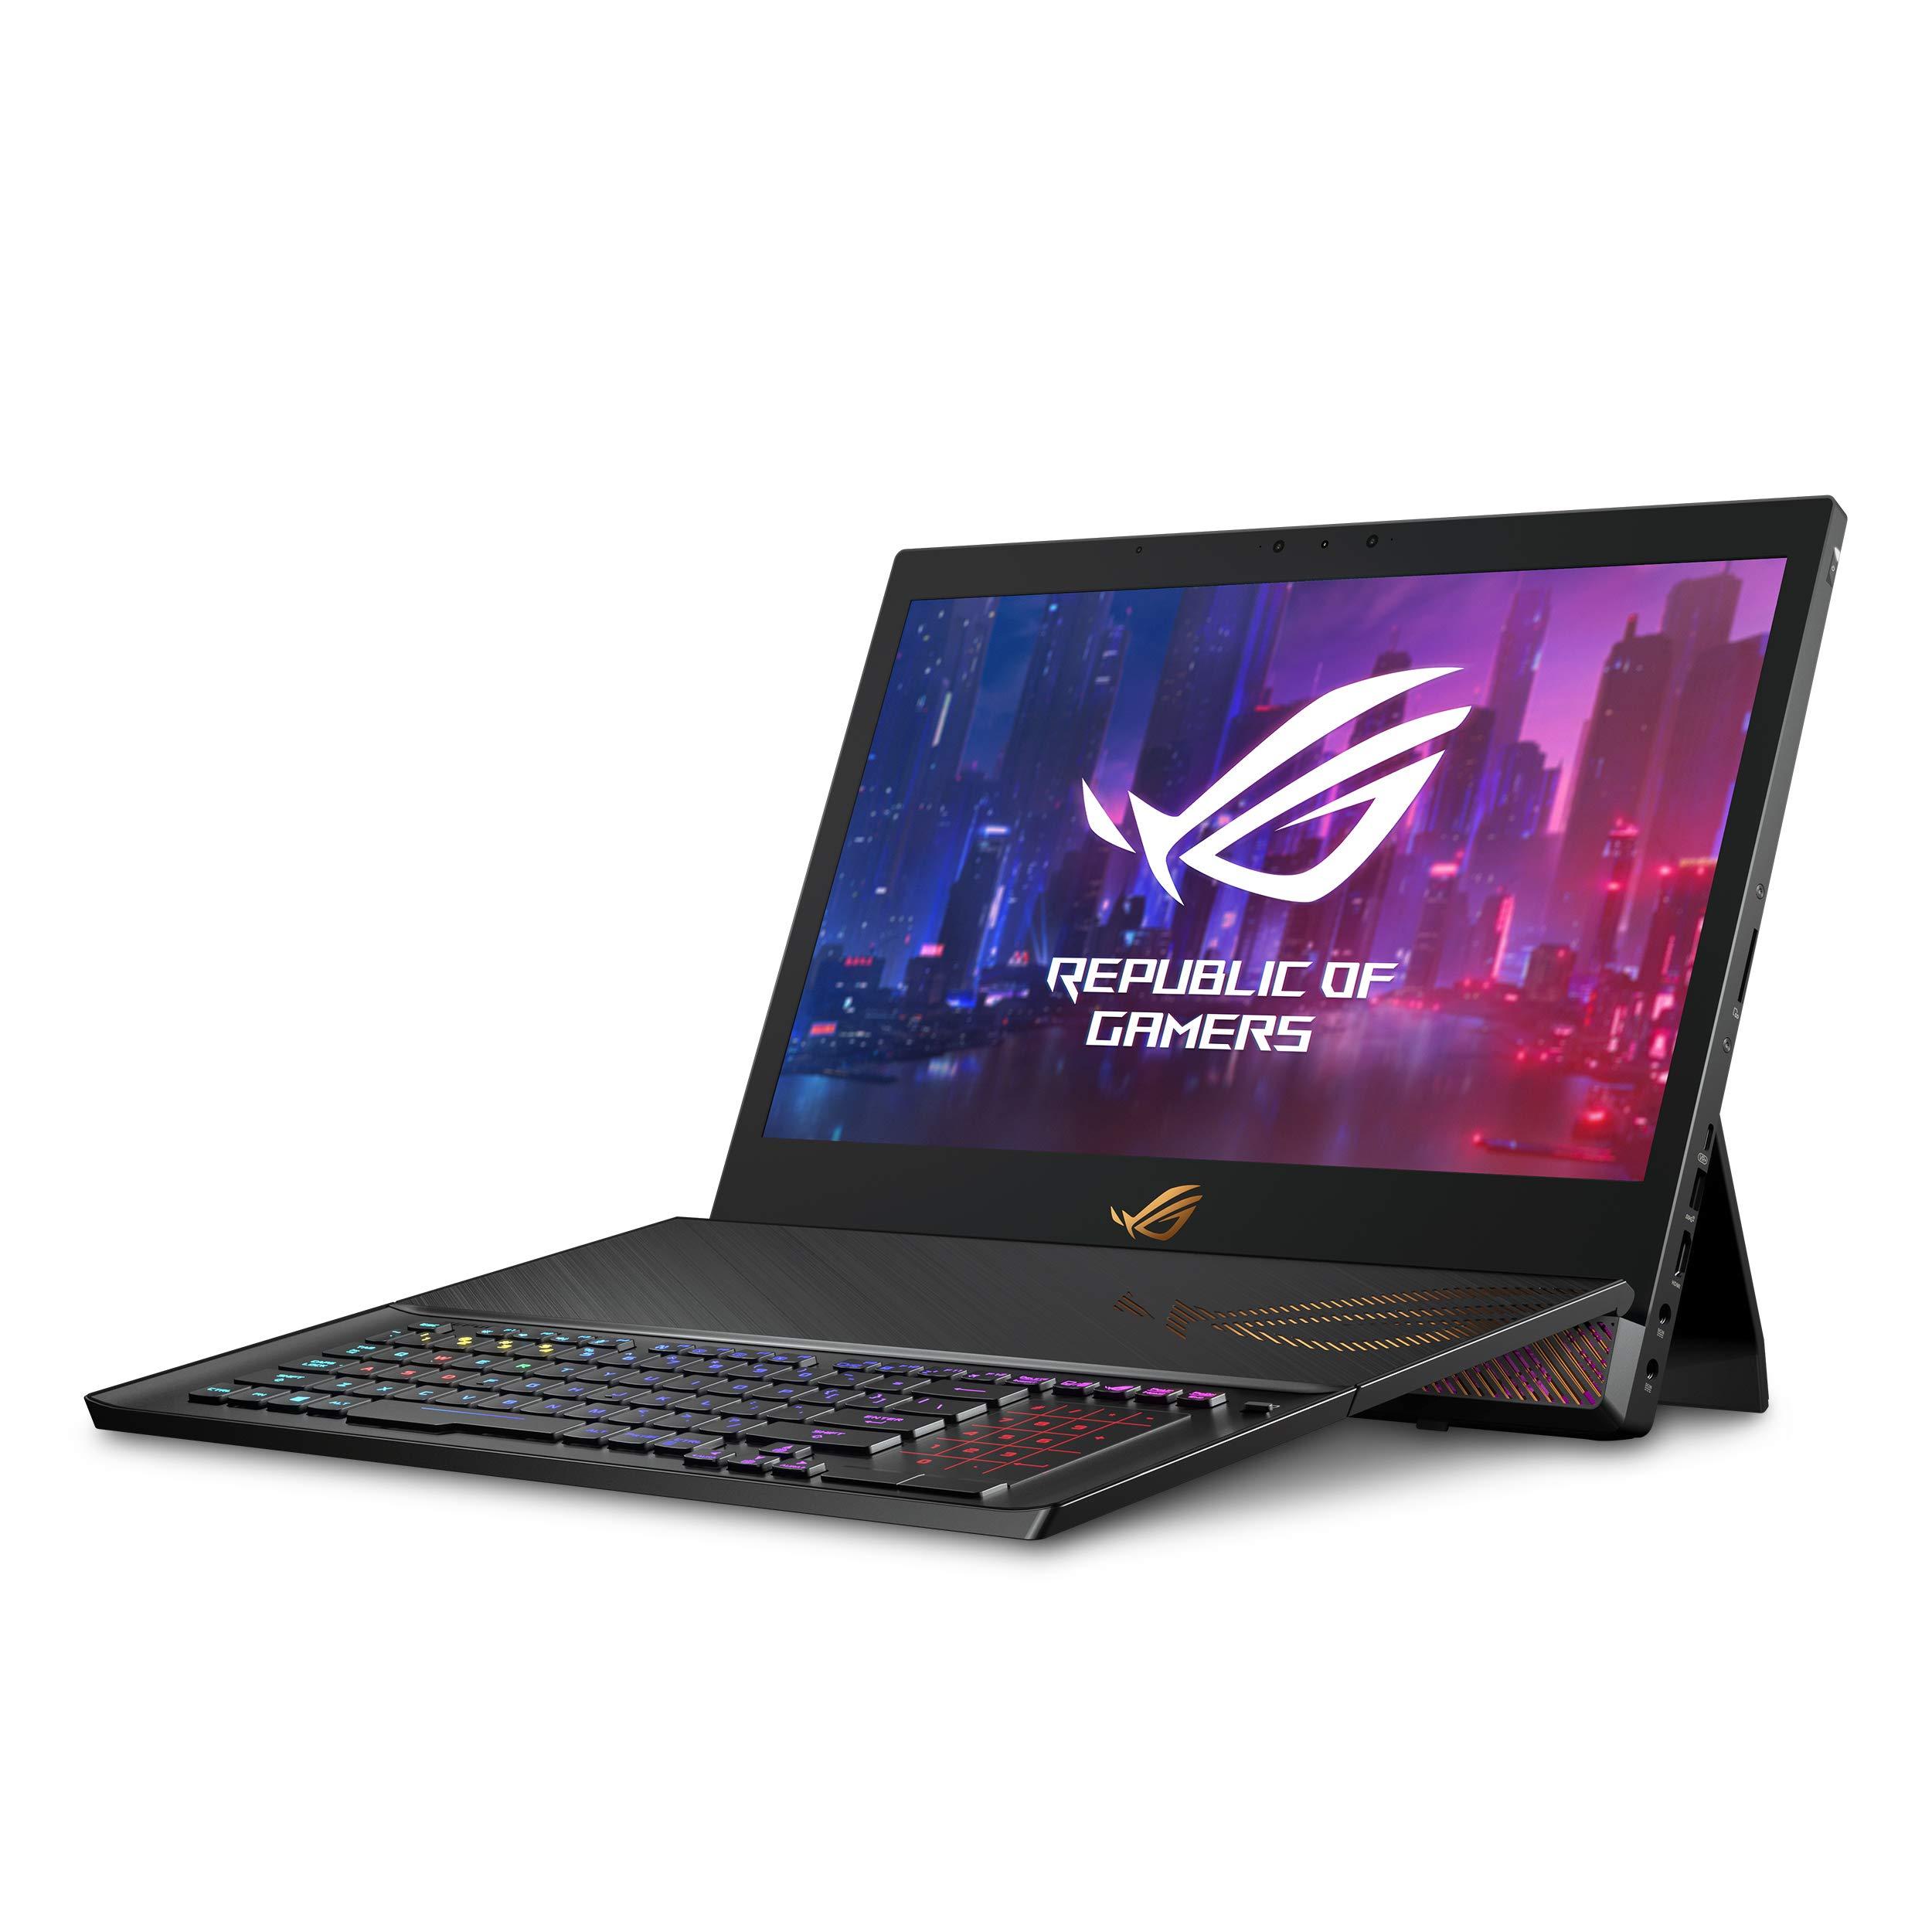 ROG Mothership GZ700 Gaming Laptop, 17.3 144Hz FHD Display with G-Sync, NVIDIA GeForce RTX 2080, Intel Core i9-9980HK, 1.5TB SSD (3X 512 in Raid0), 64GB DDR4 RAM, Windows 10 Pro, GZ700GX-XB98K